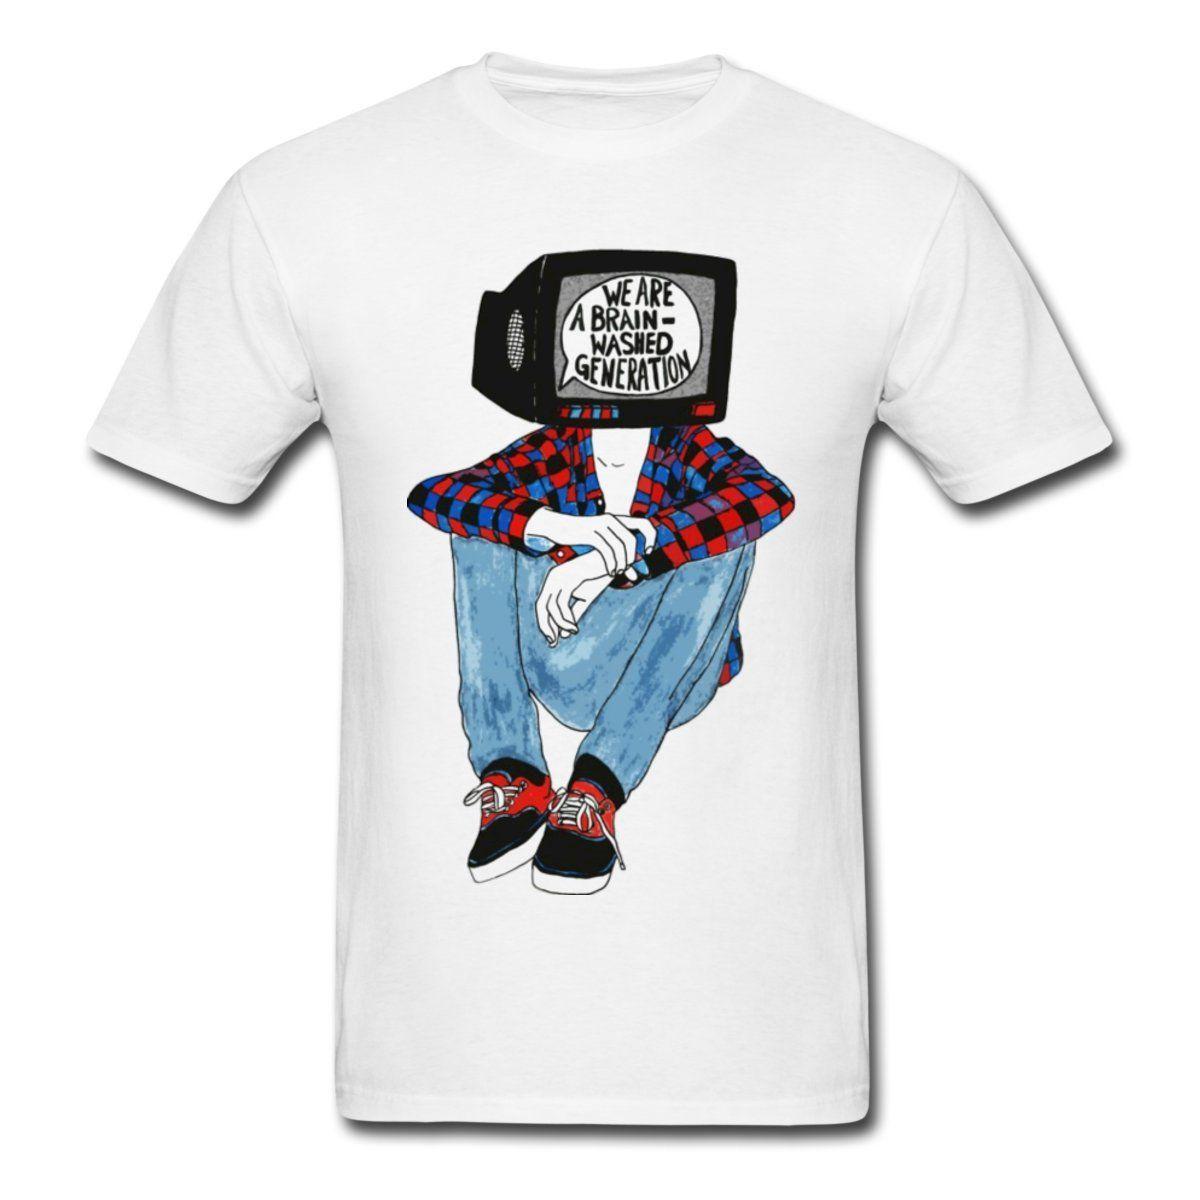 Shirt design generator - Online T Shirts Design Crew Neck Short Sleeve Zomer Brainwashed Generation T Shirts For Men